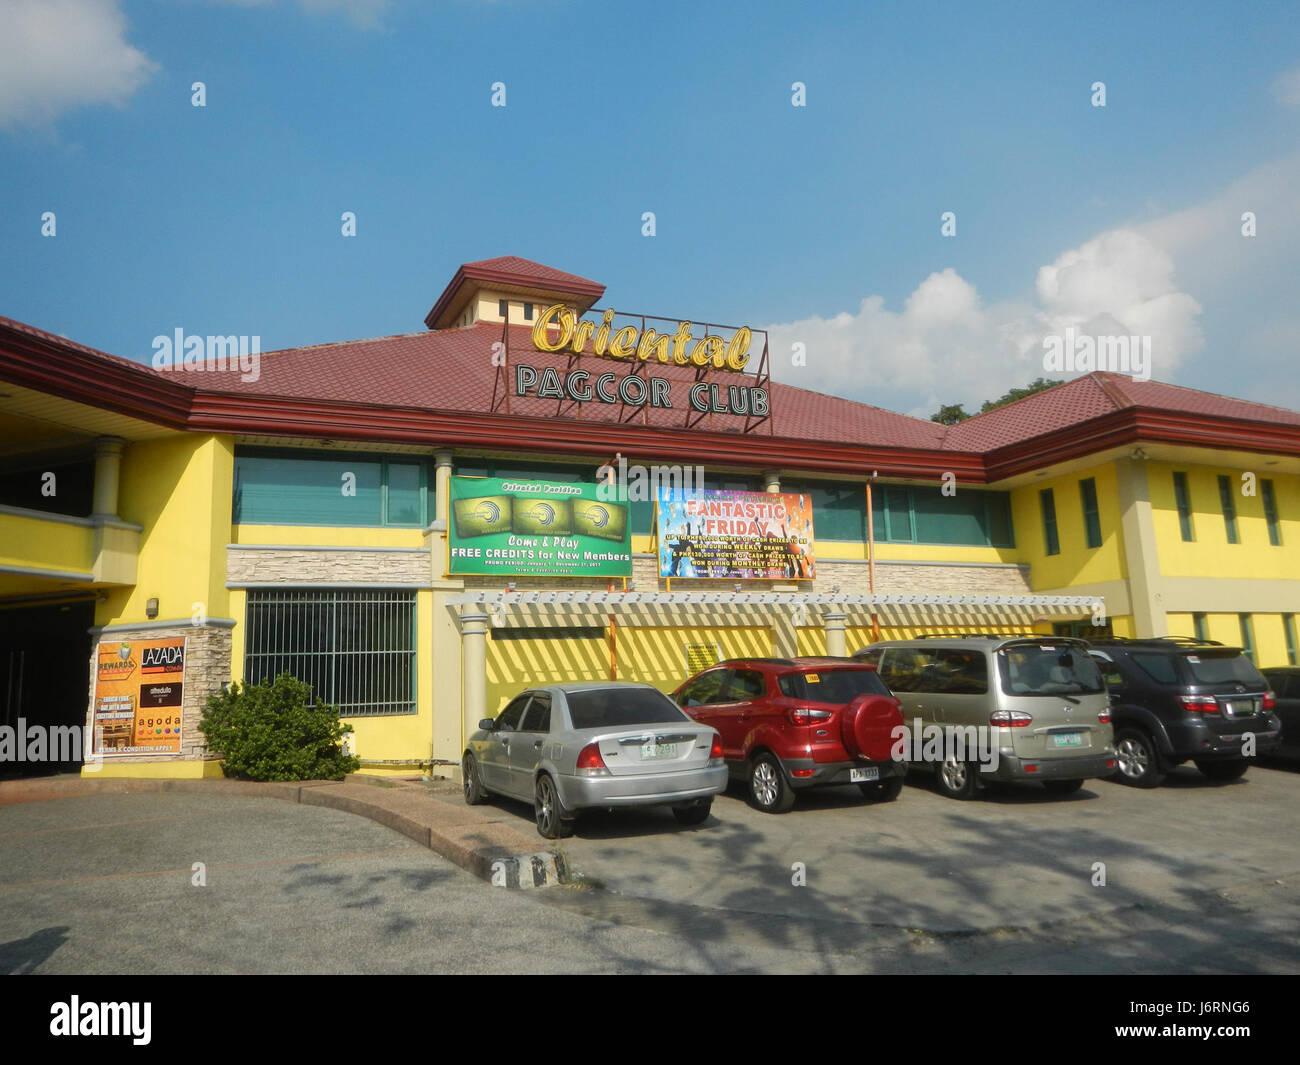 08995 Oriental Pavillion Pagcor Club Santa Cruz Guiguinto Bulacan Stock Photo Alamy